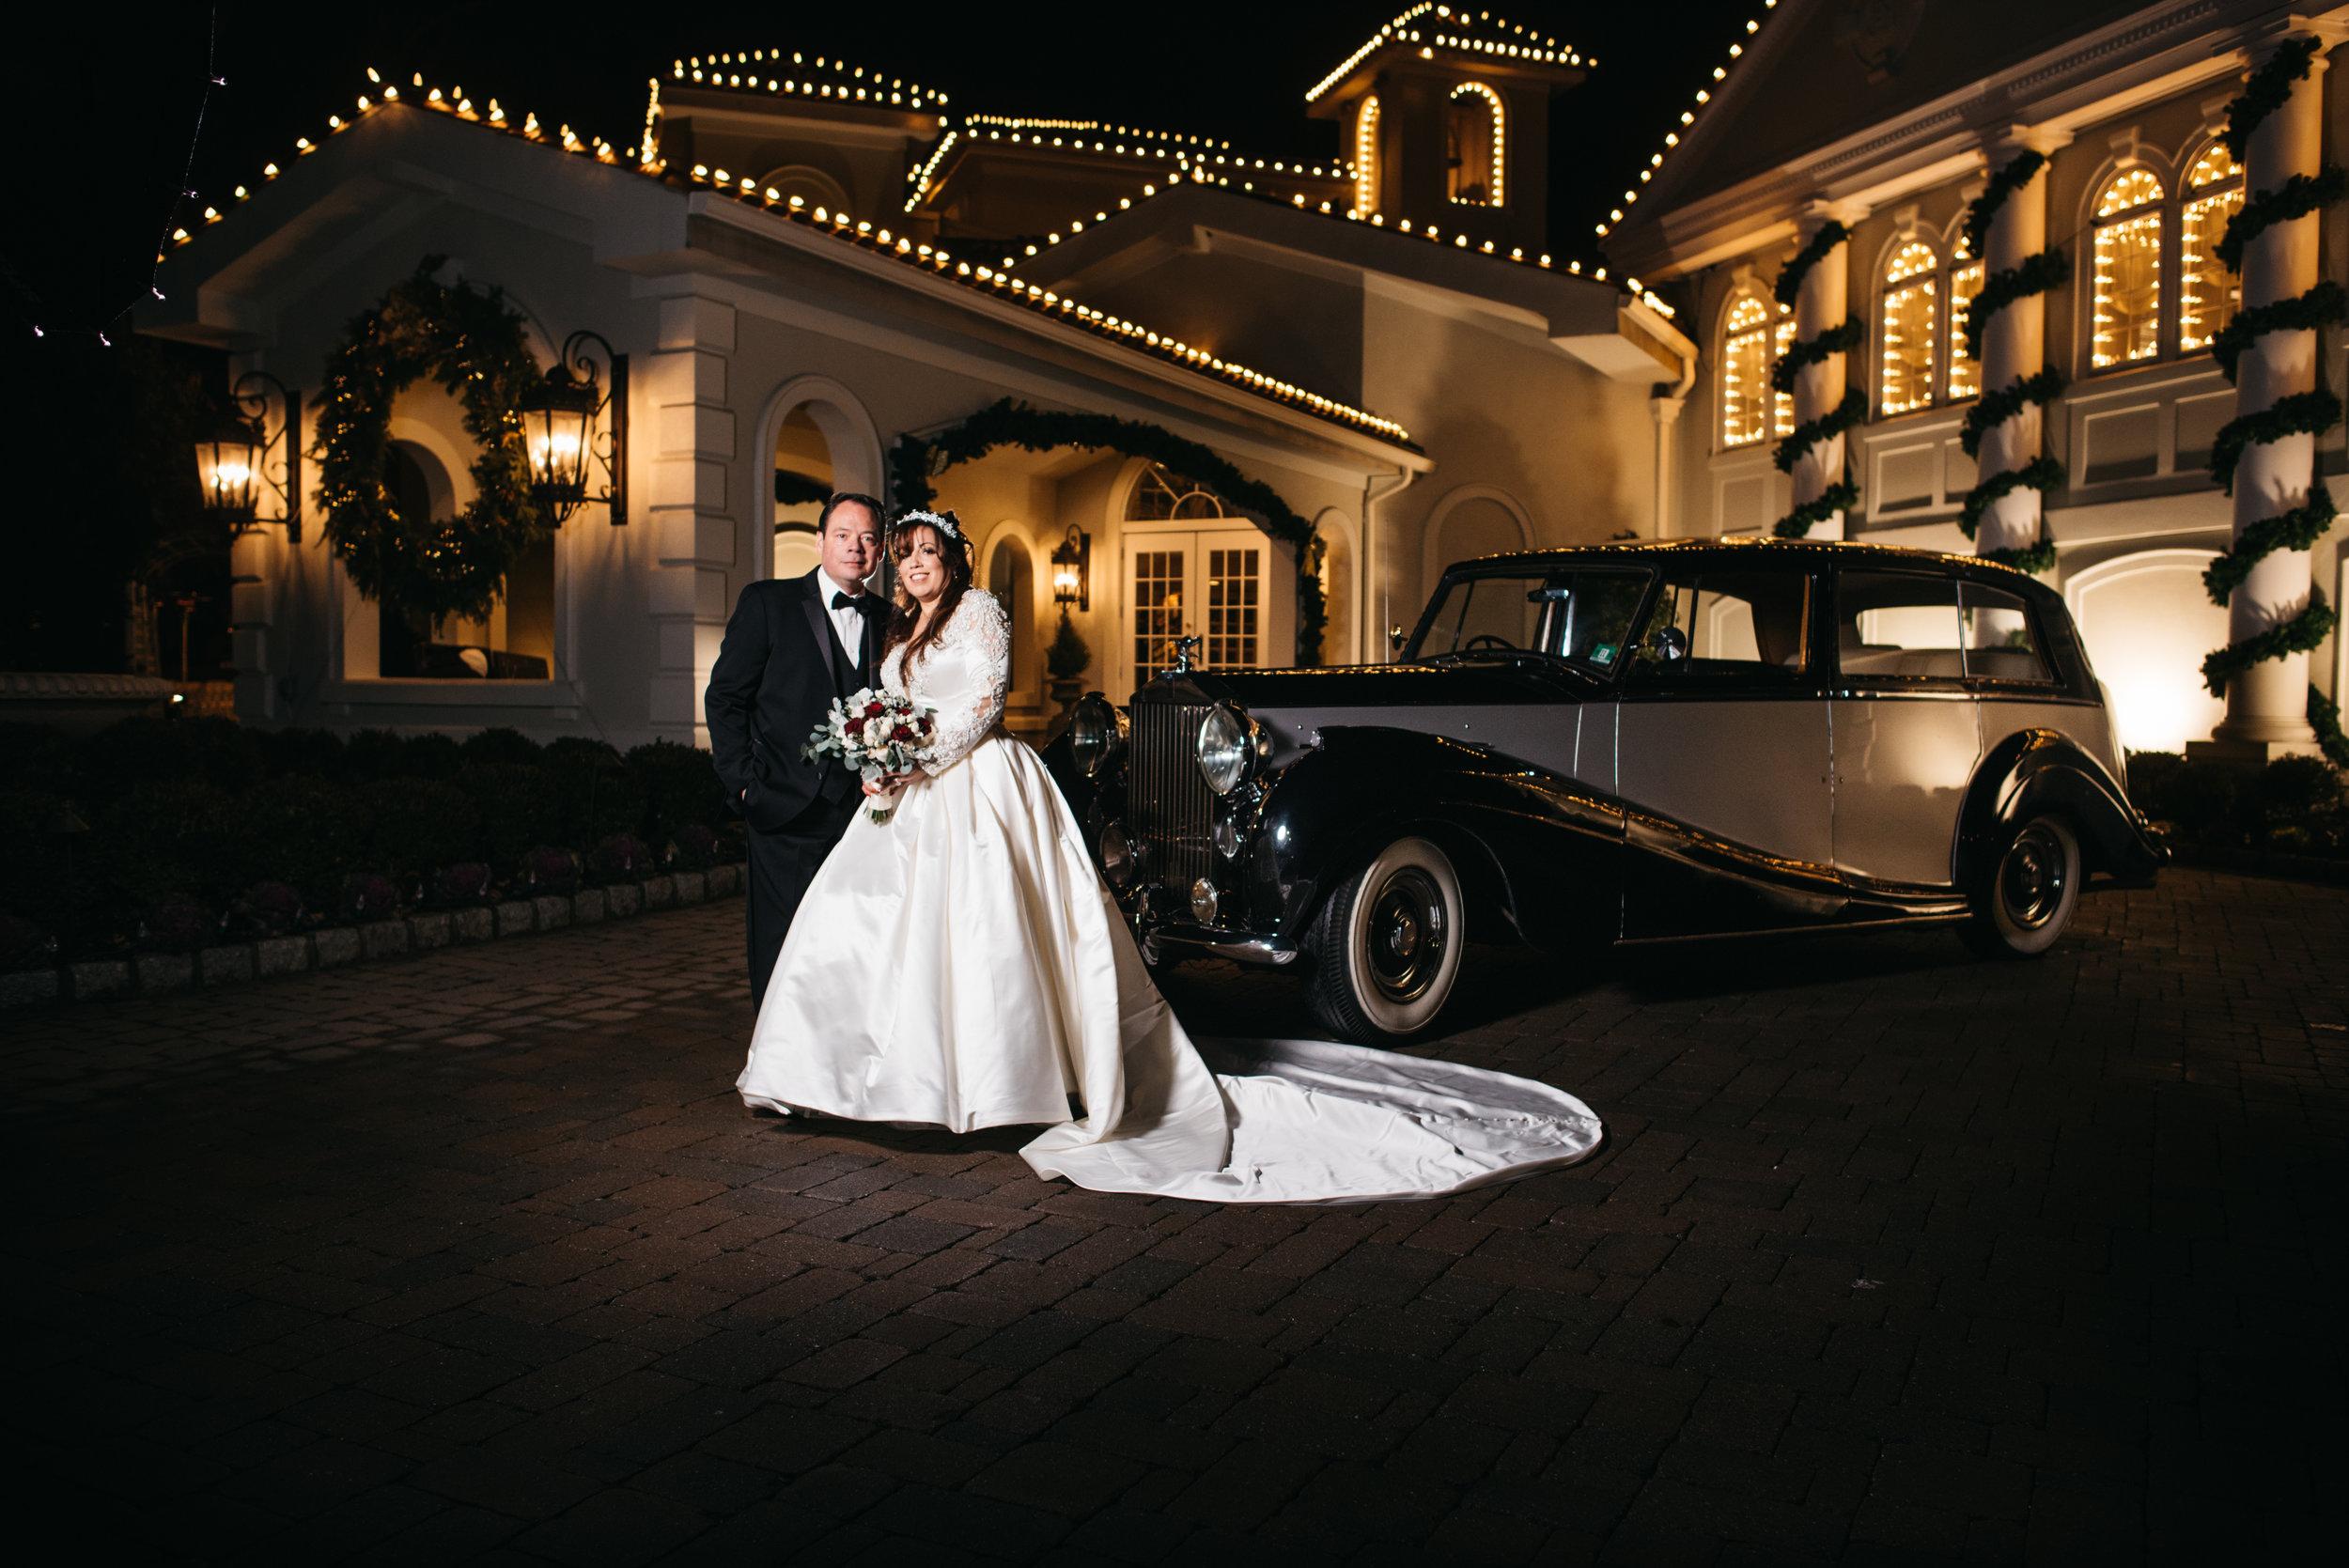 WeddingPhotos | NJPhotographer | Highlights-2-55.jpg